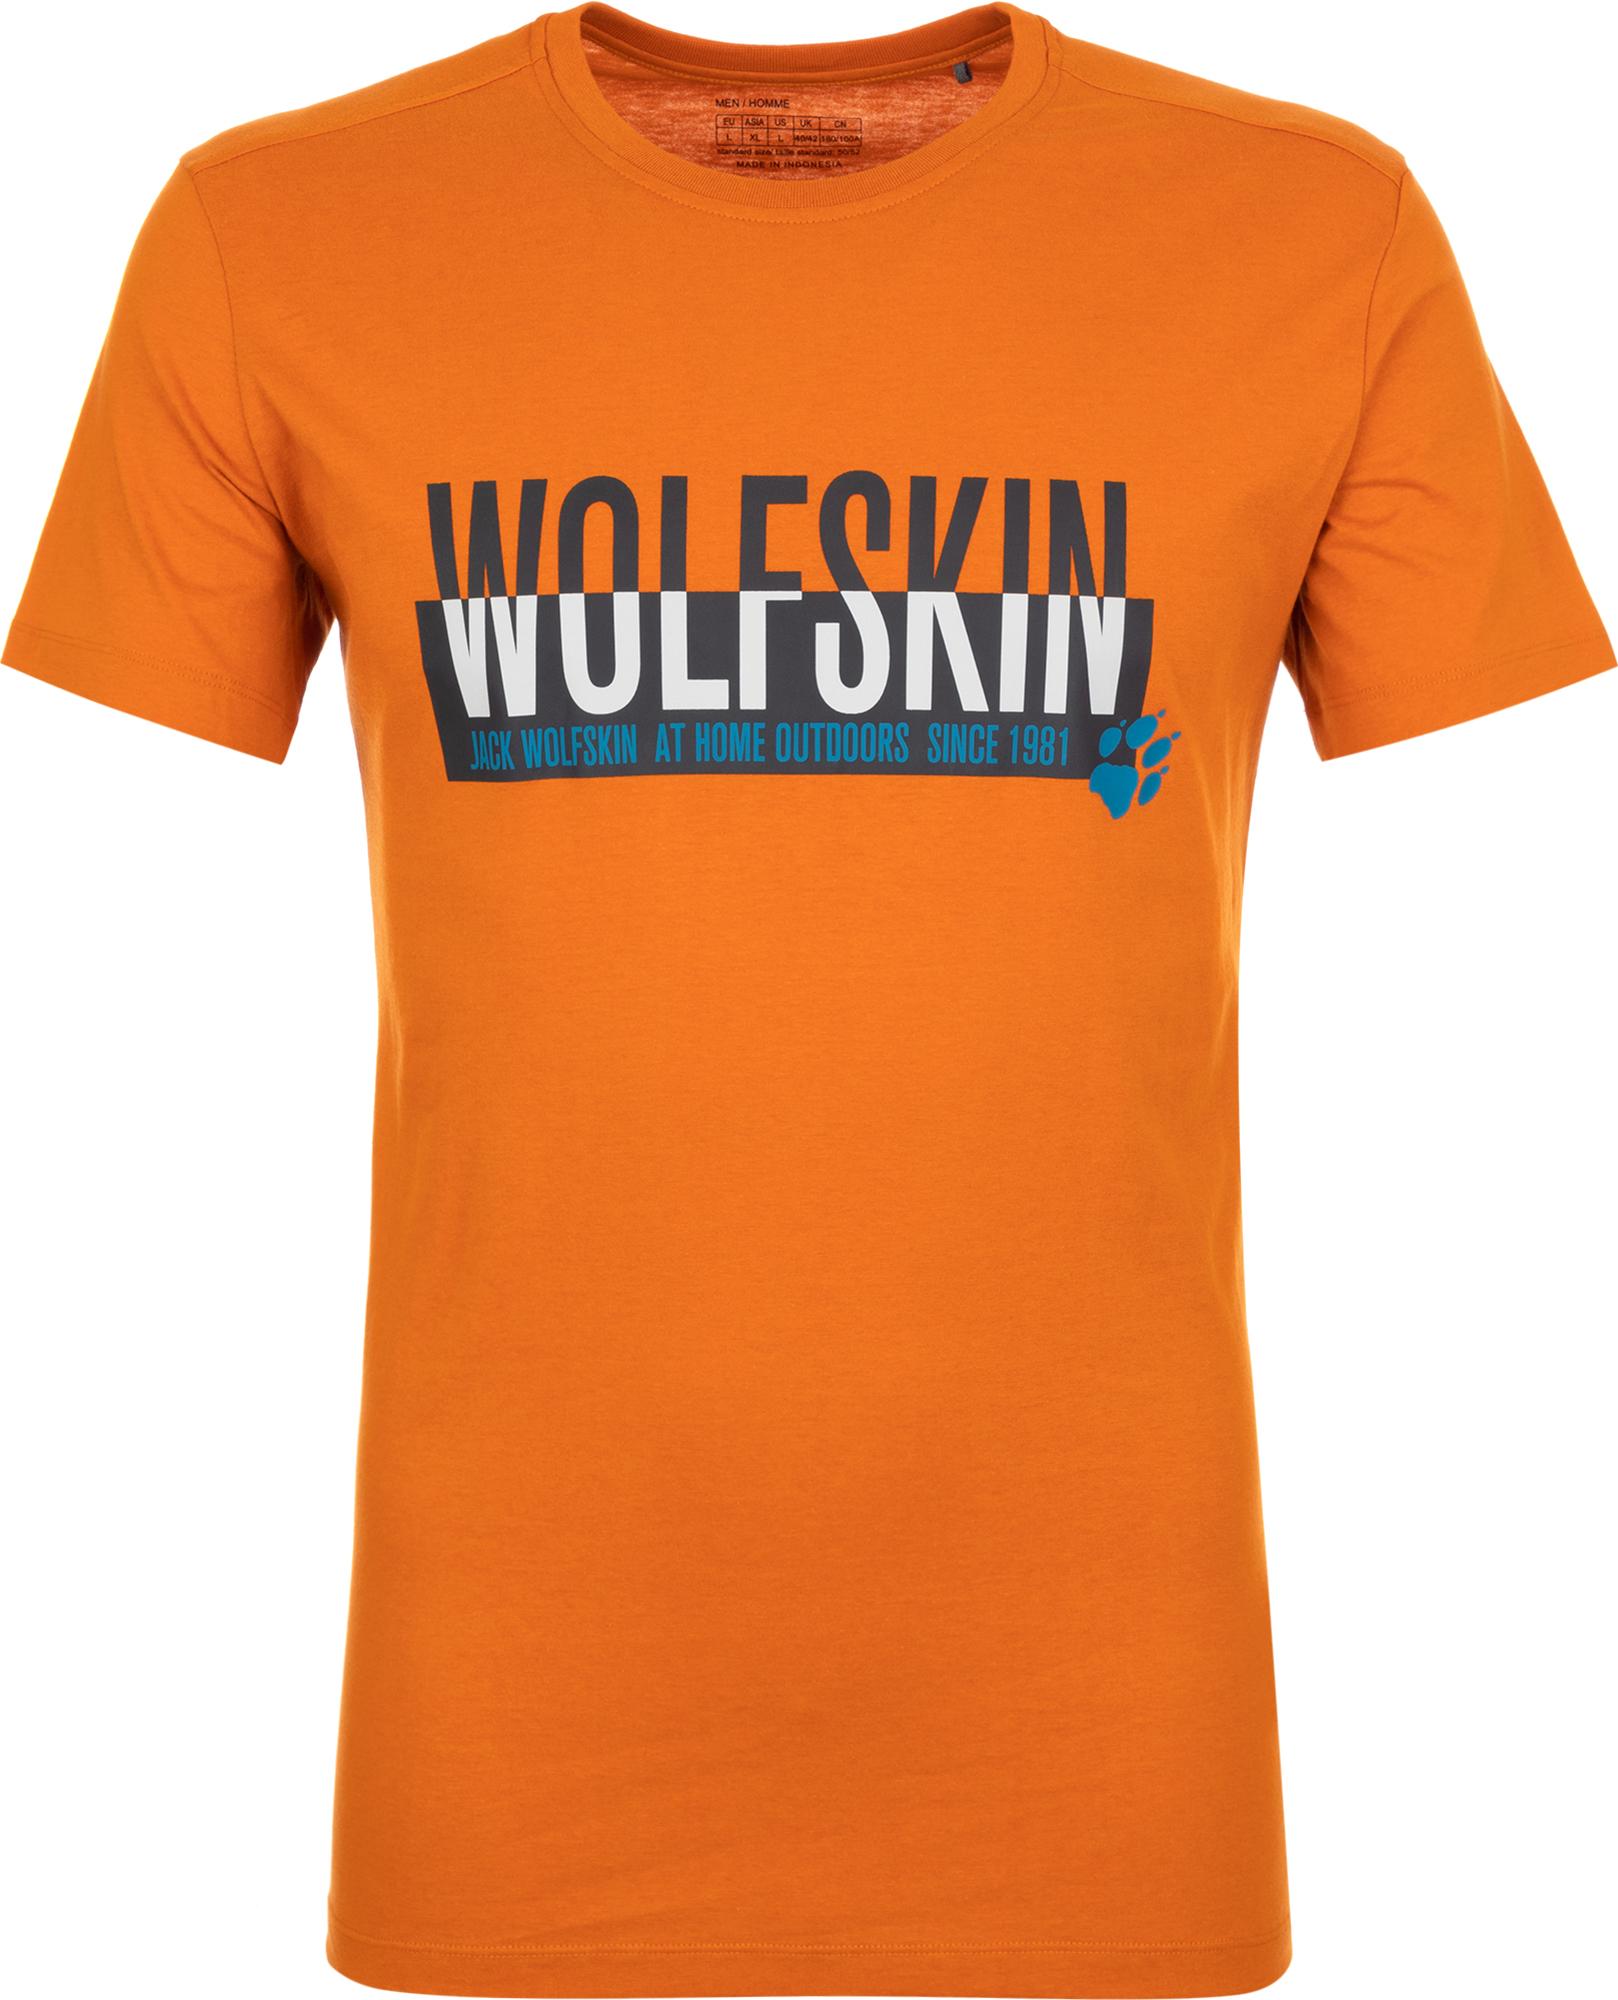 JACK WOLFSKIN Футболка мужская JACK WOLFSKIN Slogan, размер 44